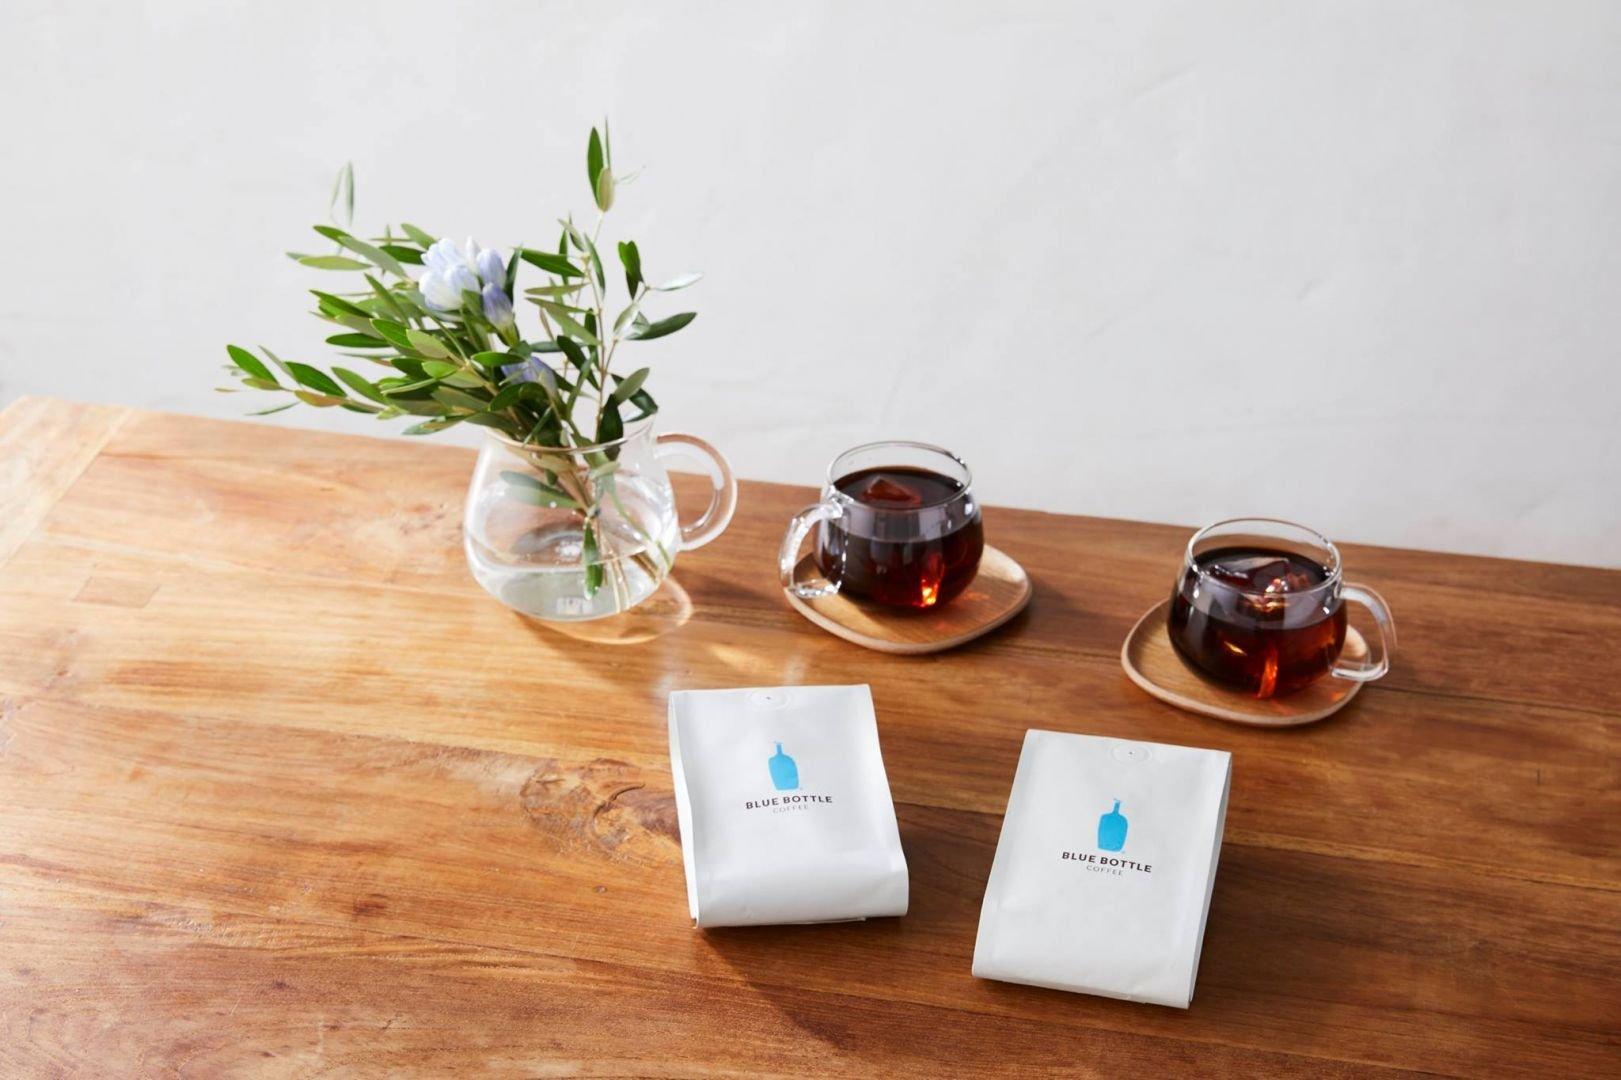 img 5aa9b4f32df39 - Blue Bottle藍瓶咖啡京都店下週熱烈開幕:獨家抹茶餅乾、多款限定商品!